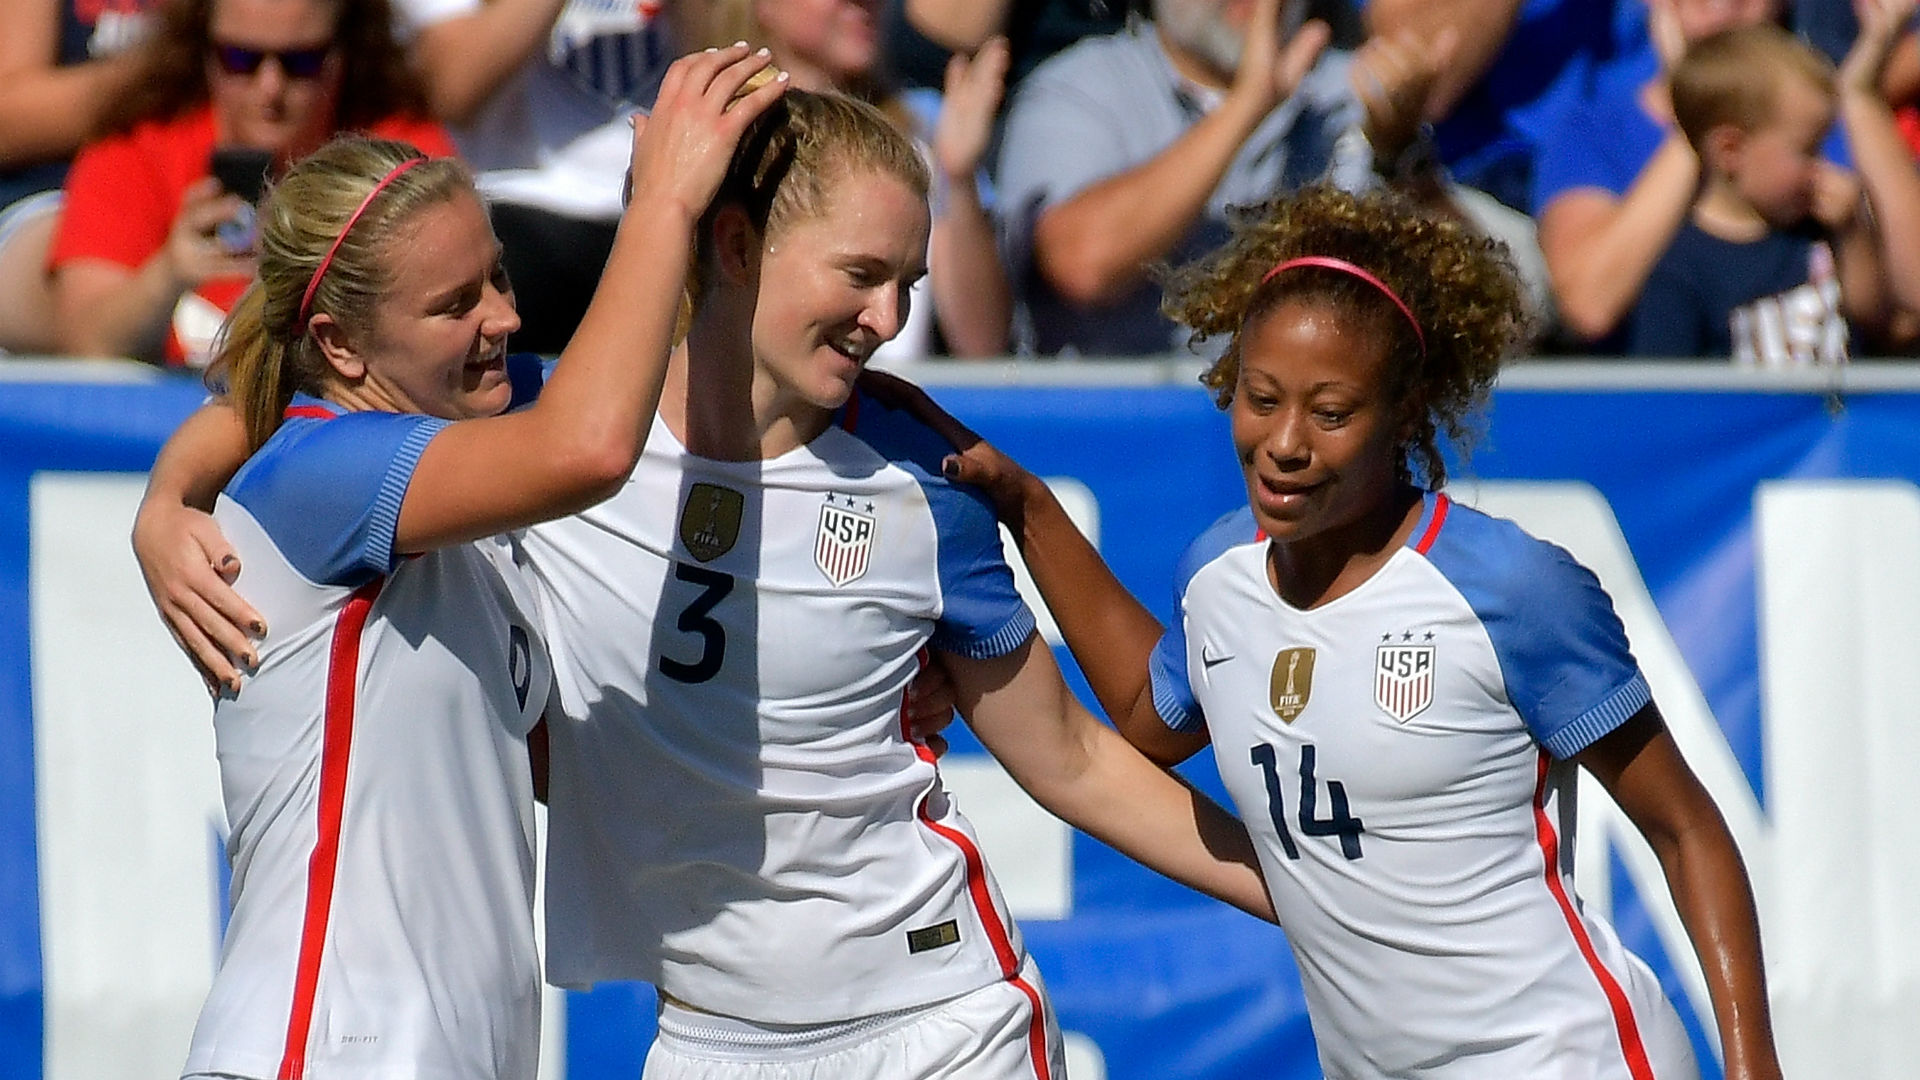 Samantha-mewis-us-womens-national-team_fmjblhkwjvx1ha0kcbsp4aqc